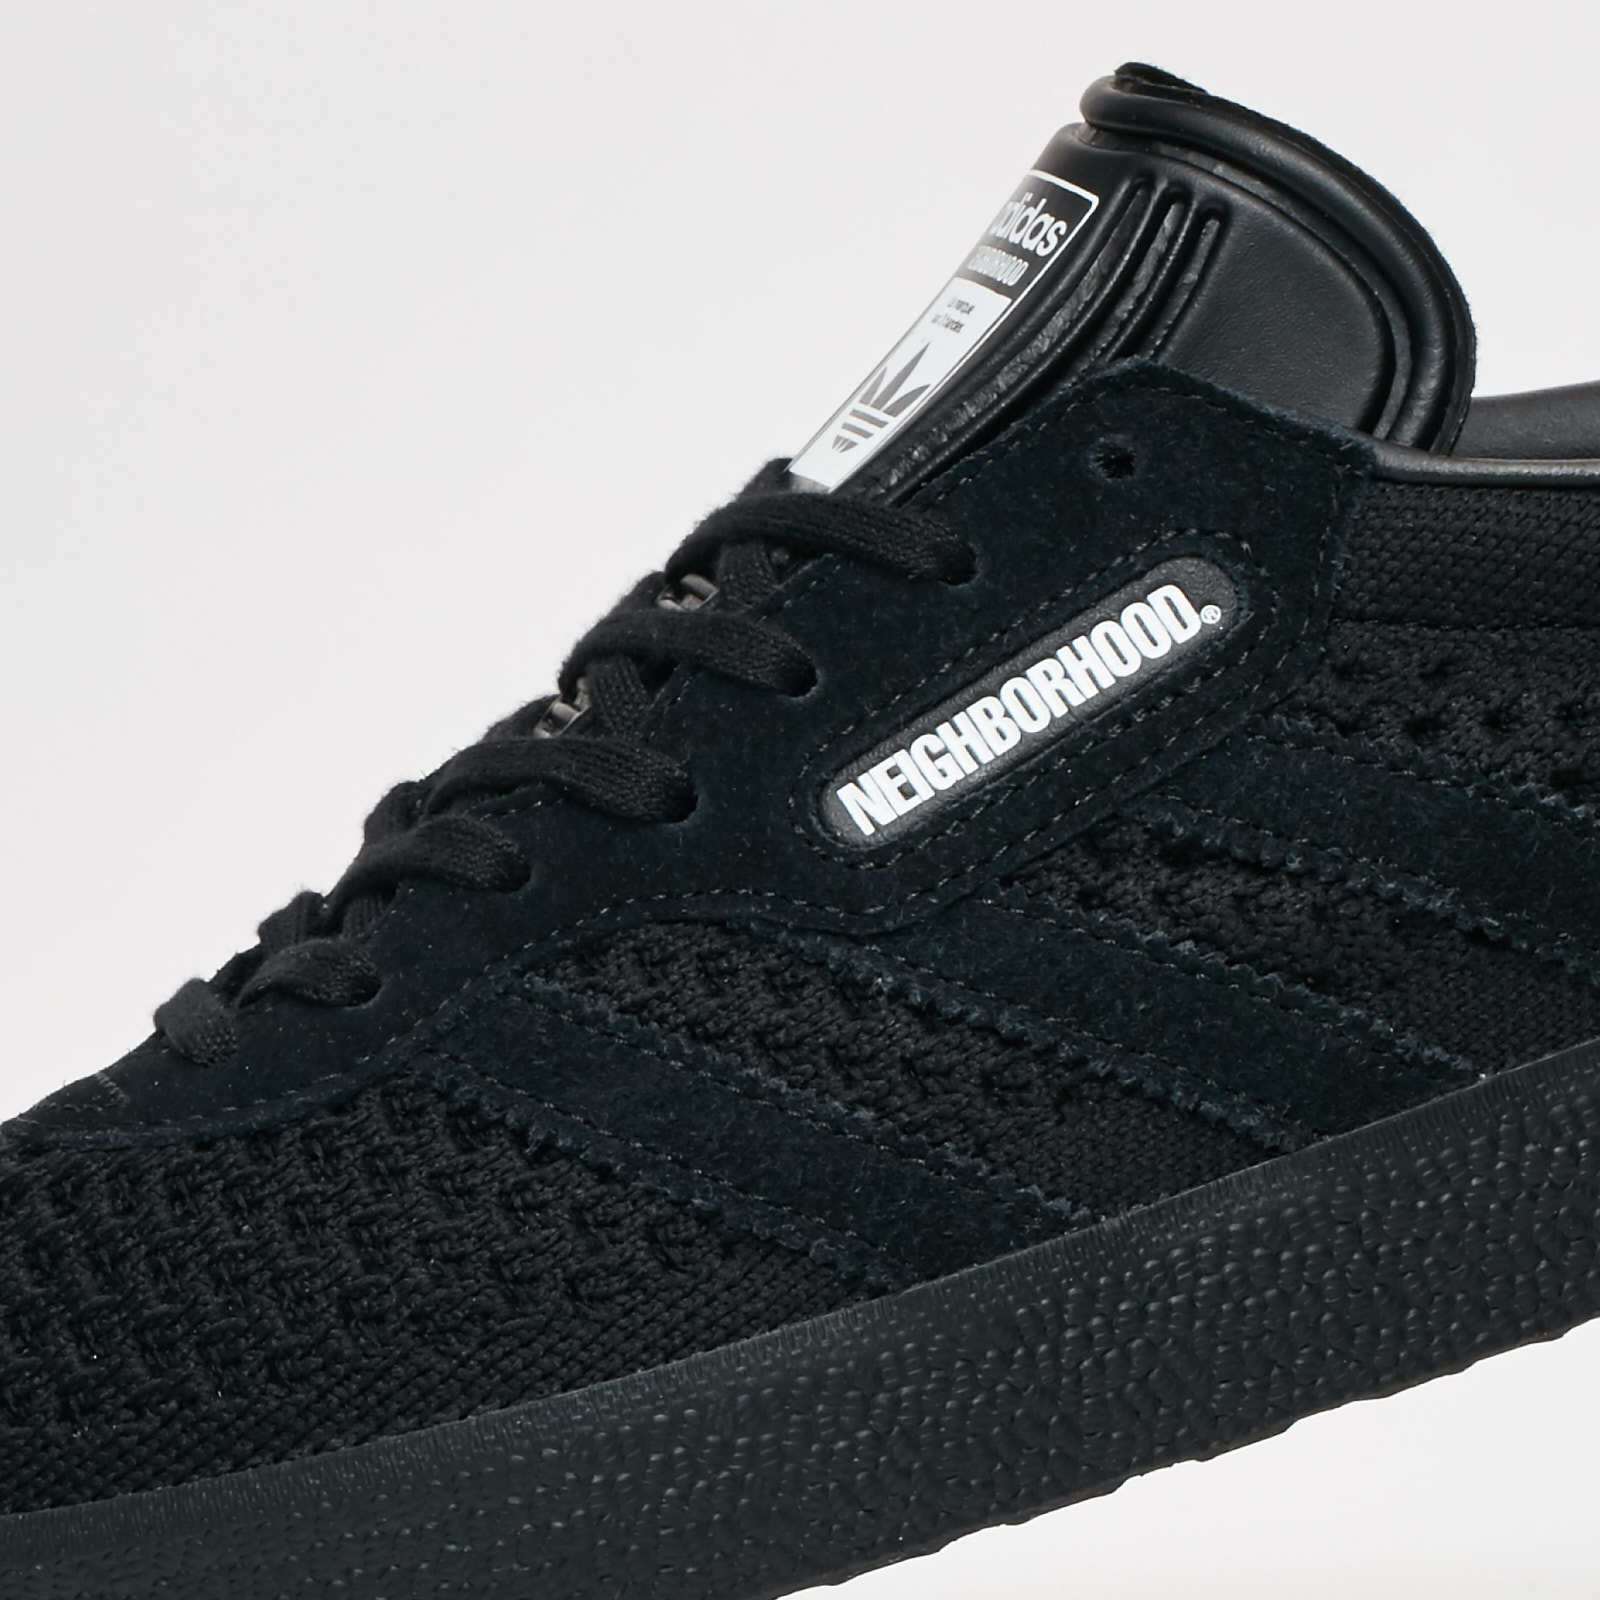 buy popular 9134e c41bb adidas Gazelle Super x Neighborhood - Da8836 - Sneakersnstuff ...